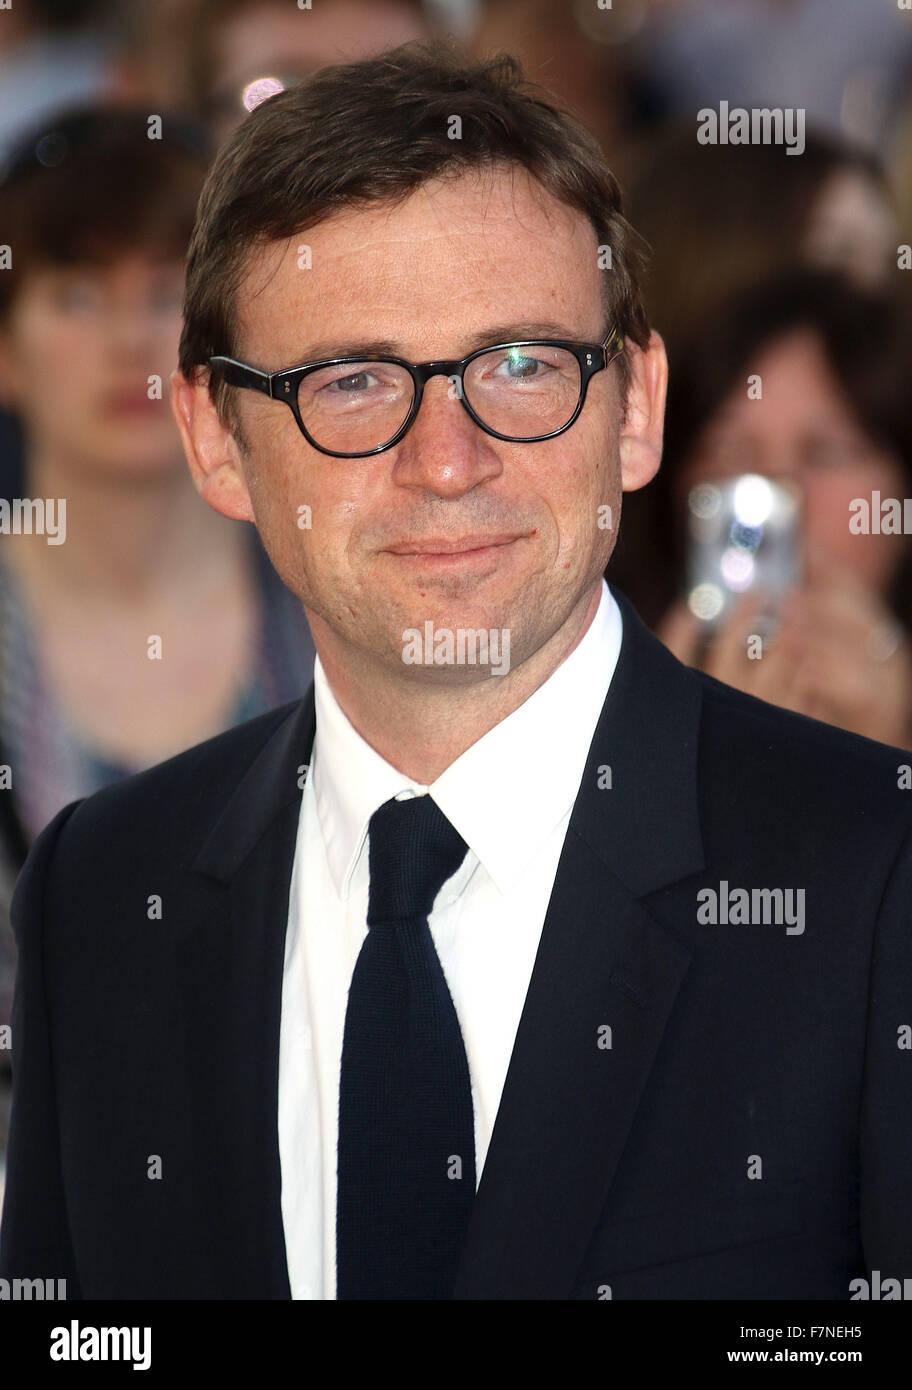 Apr 15, 2015 - London, England, UK - David Nicholls attending Far From the Madding Crowd World Premiere, BFI Southbank - Stock Image